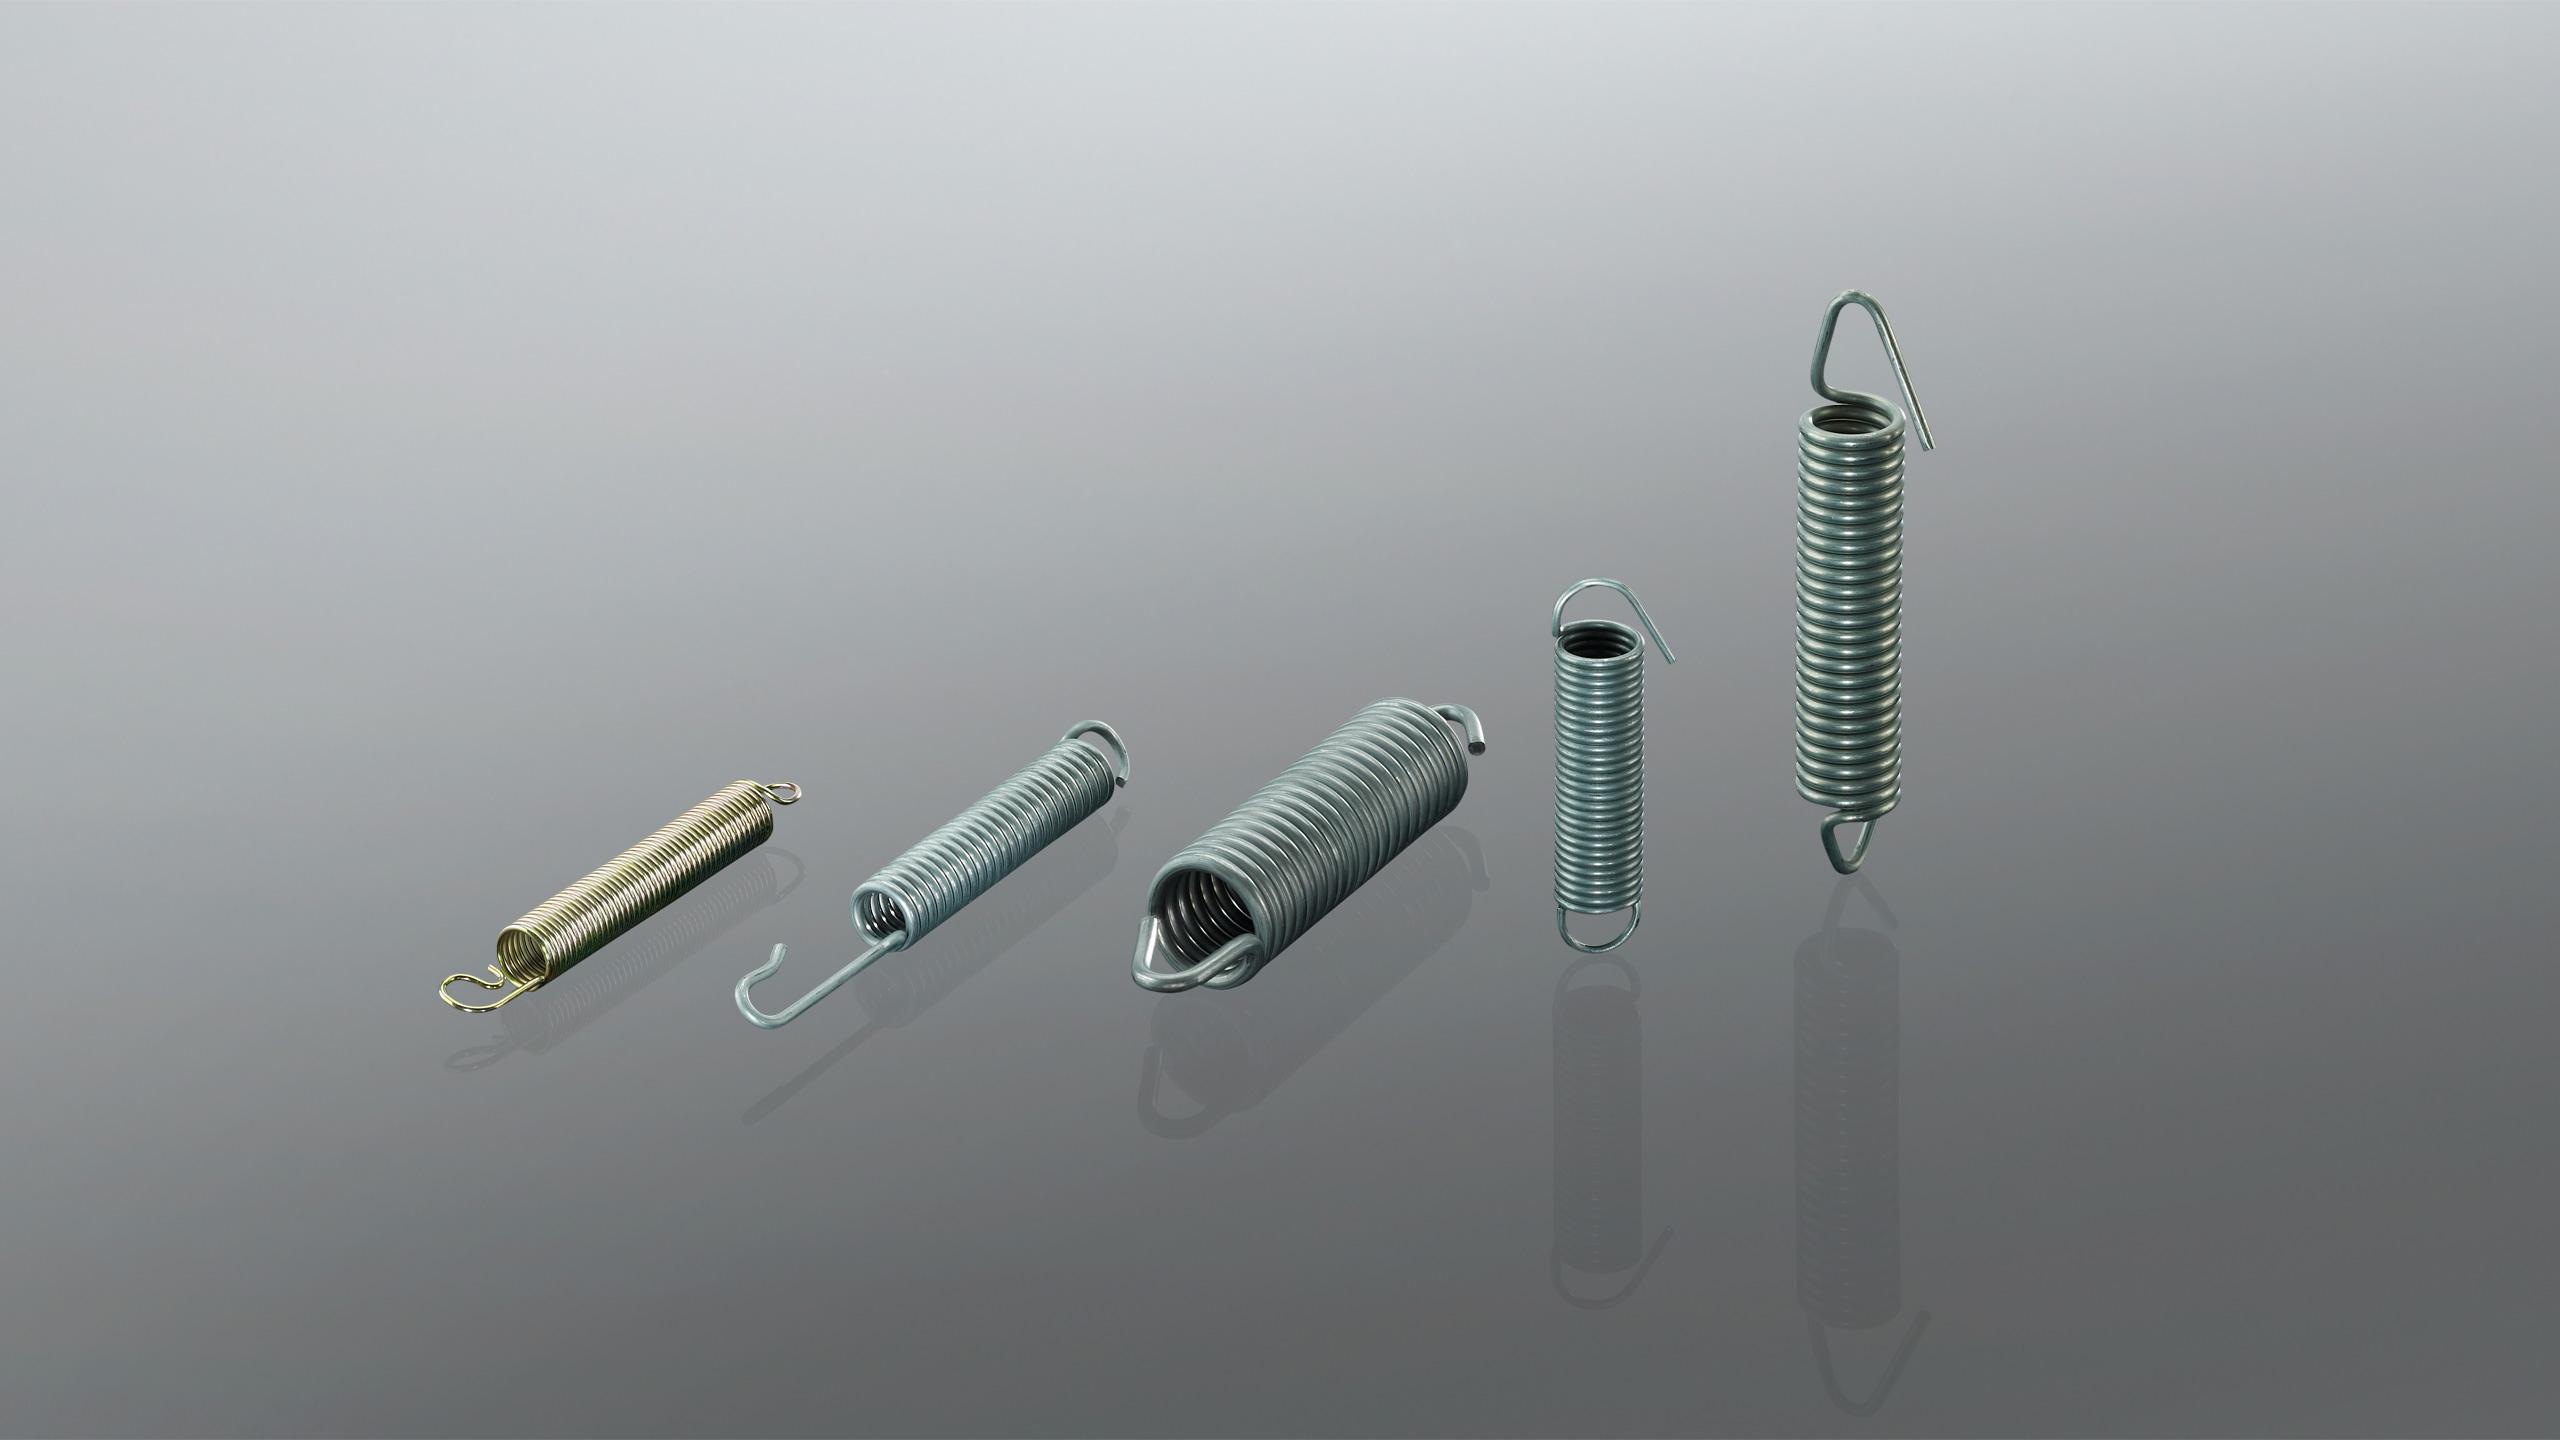 Breites Anwendungsspektrum Length : 2x13x60mm 60-200 2ST mm L/änge Stahl Zugschraubenfeder Zugfeder Mit Hooks.2mm Drahtdurchmesser 13mm Out Durchmesser Aojing LHjin-Spannh/ülsen